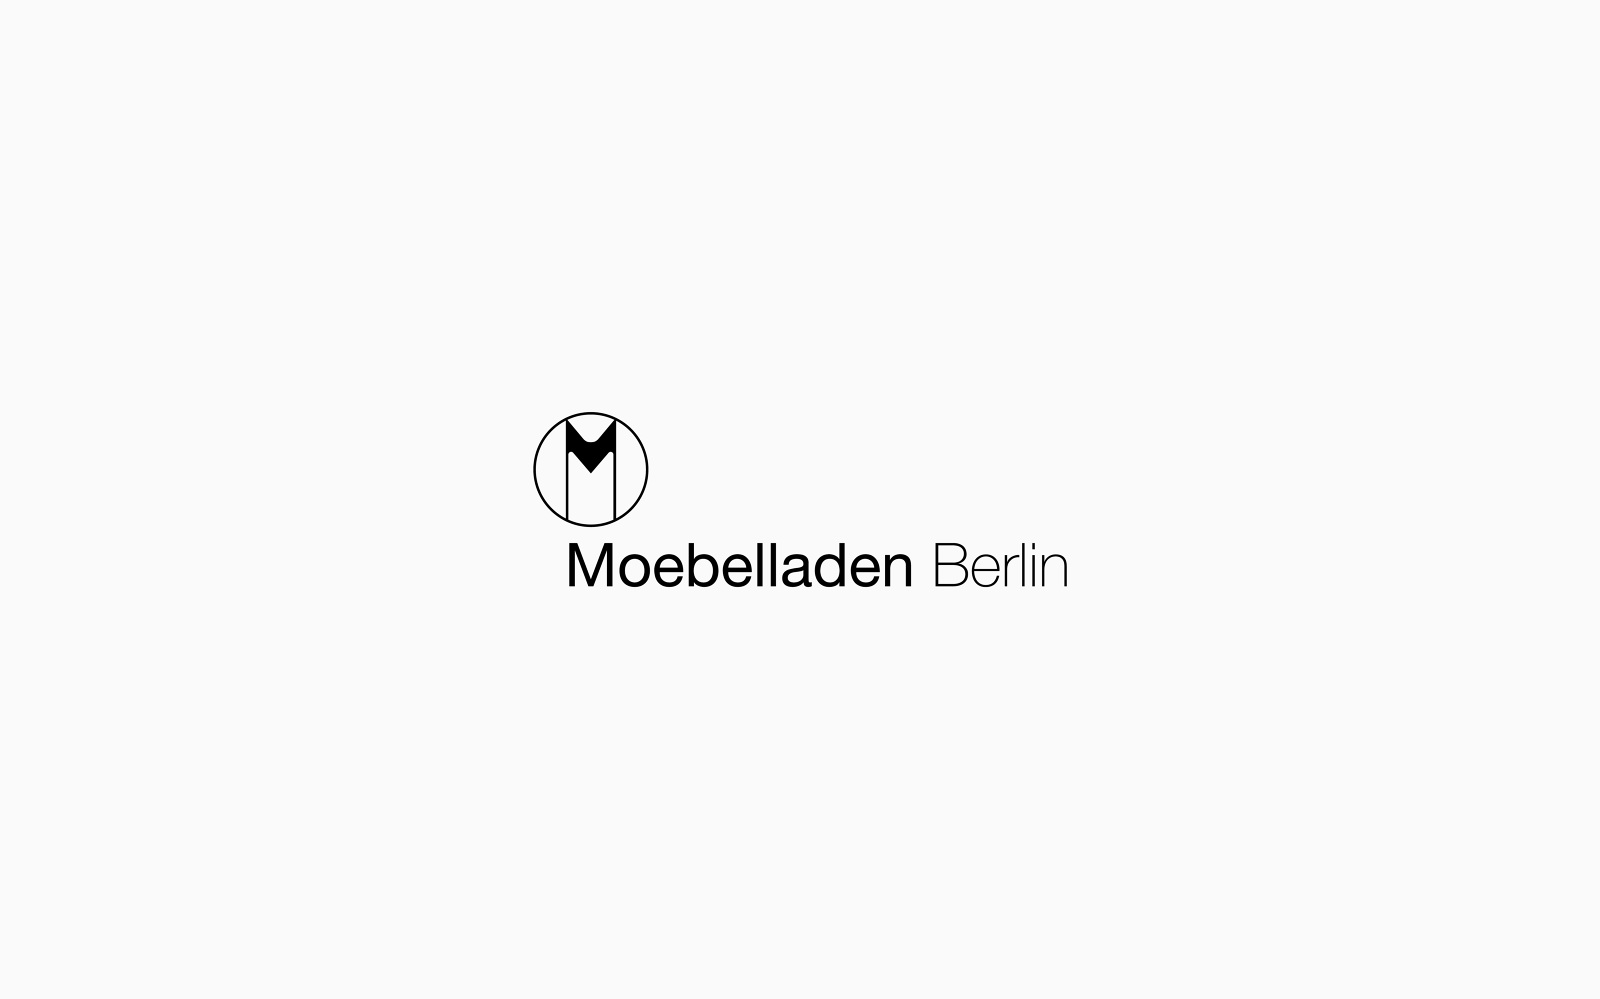 Möbelreparatur Berlin moebelladen stefan lucut senior graphic designer